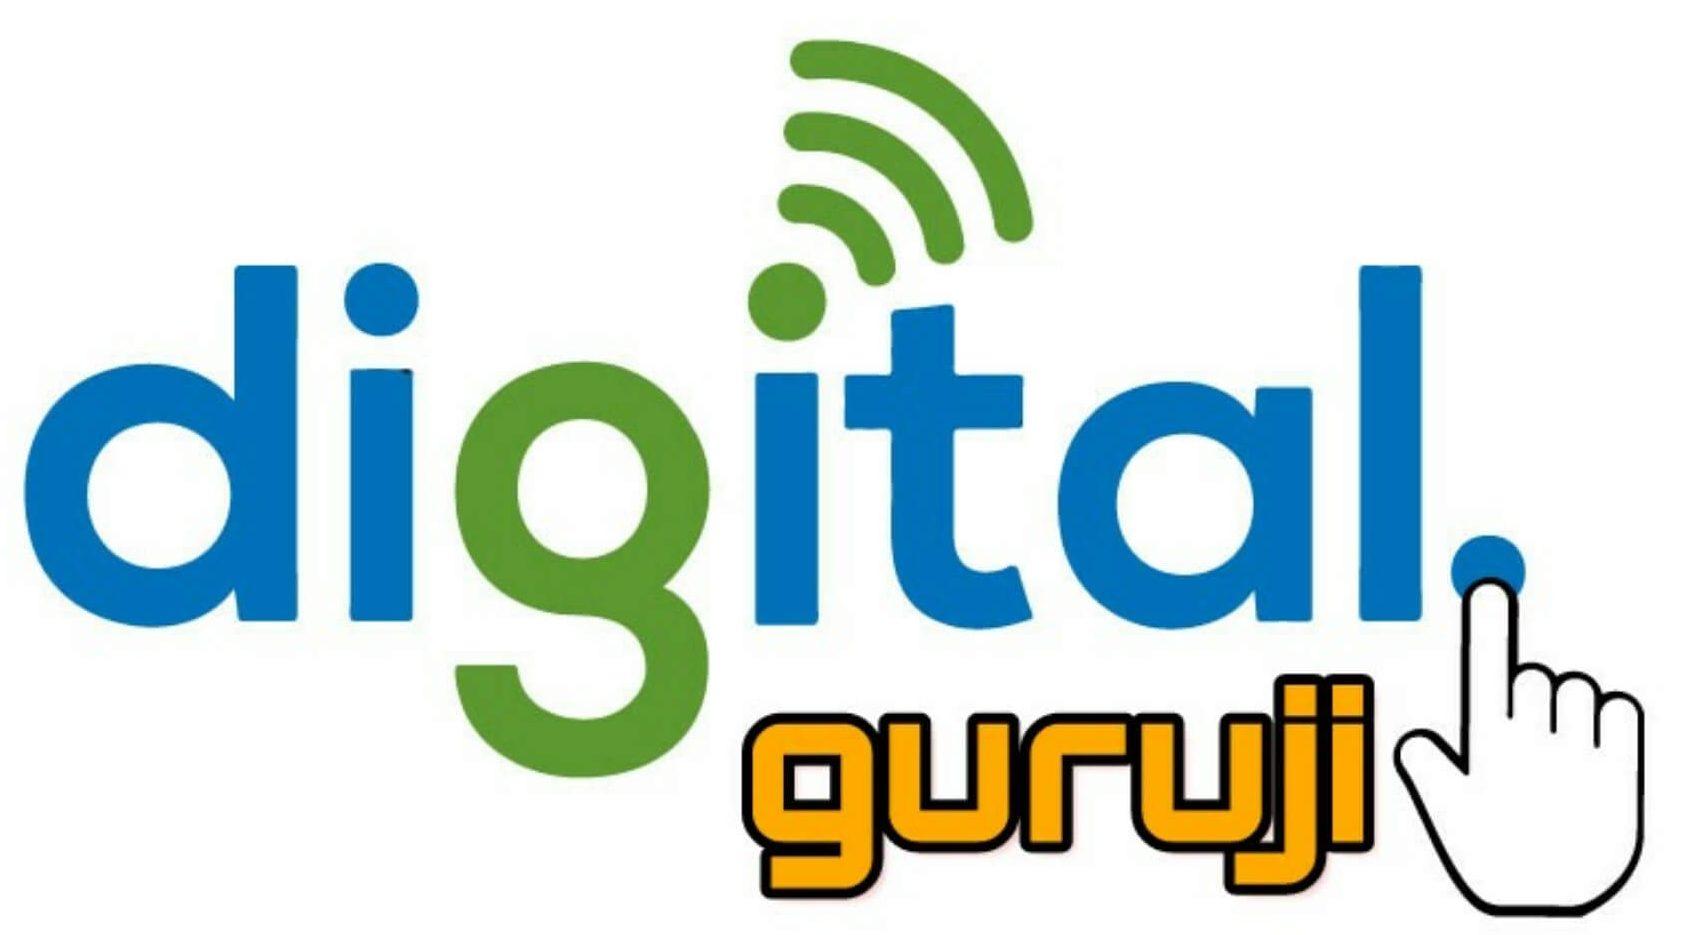 Digital Guruji Balipal